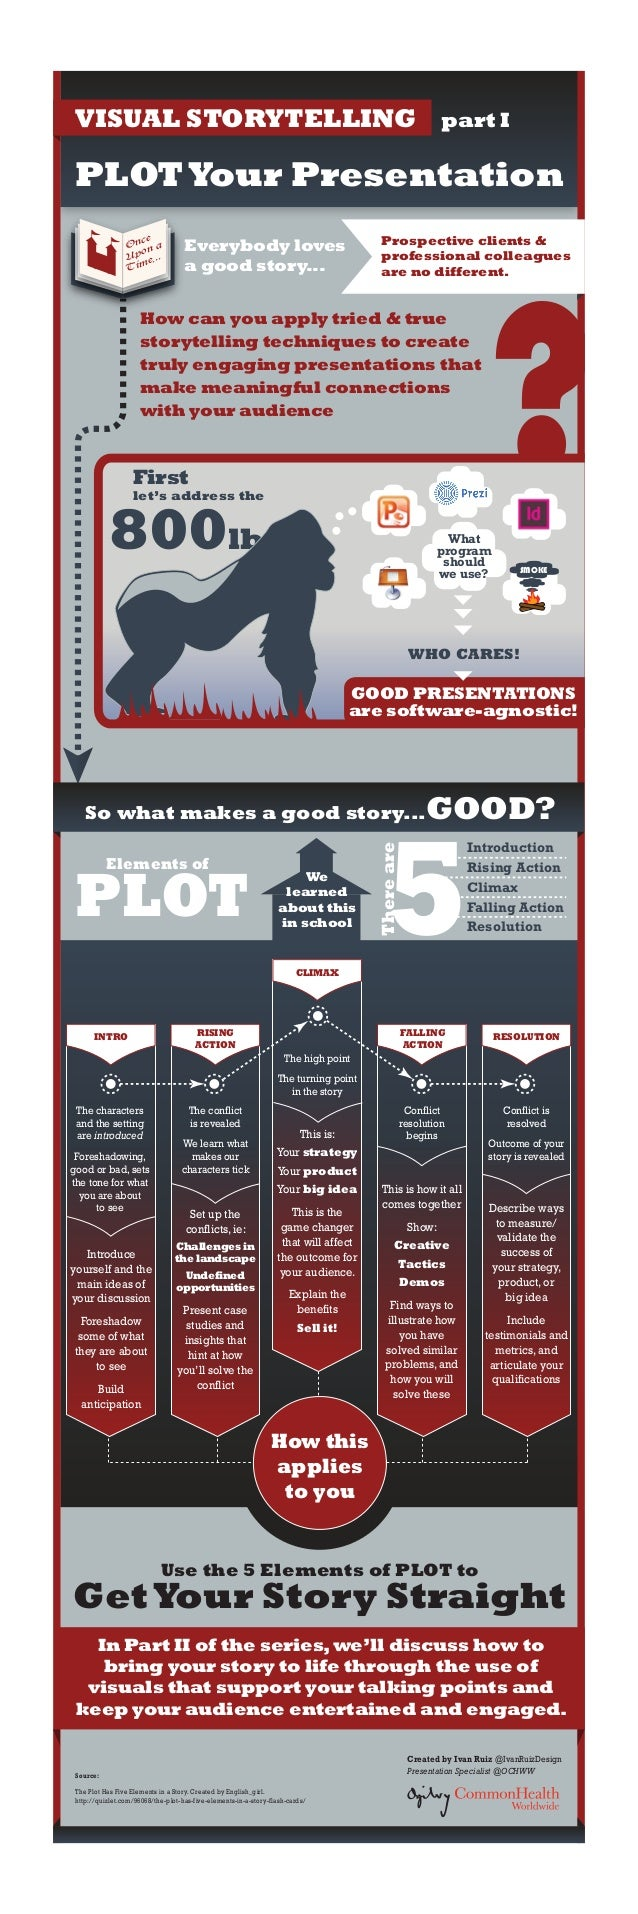 Visual Storytelling Part 1: PLOT Your Presentation